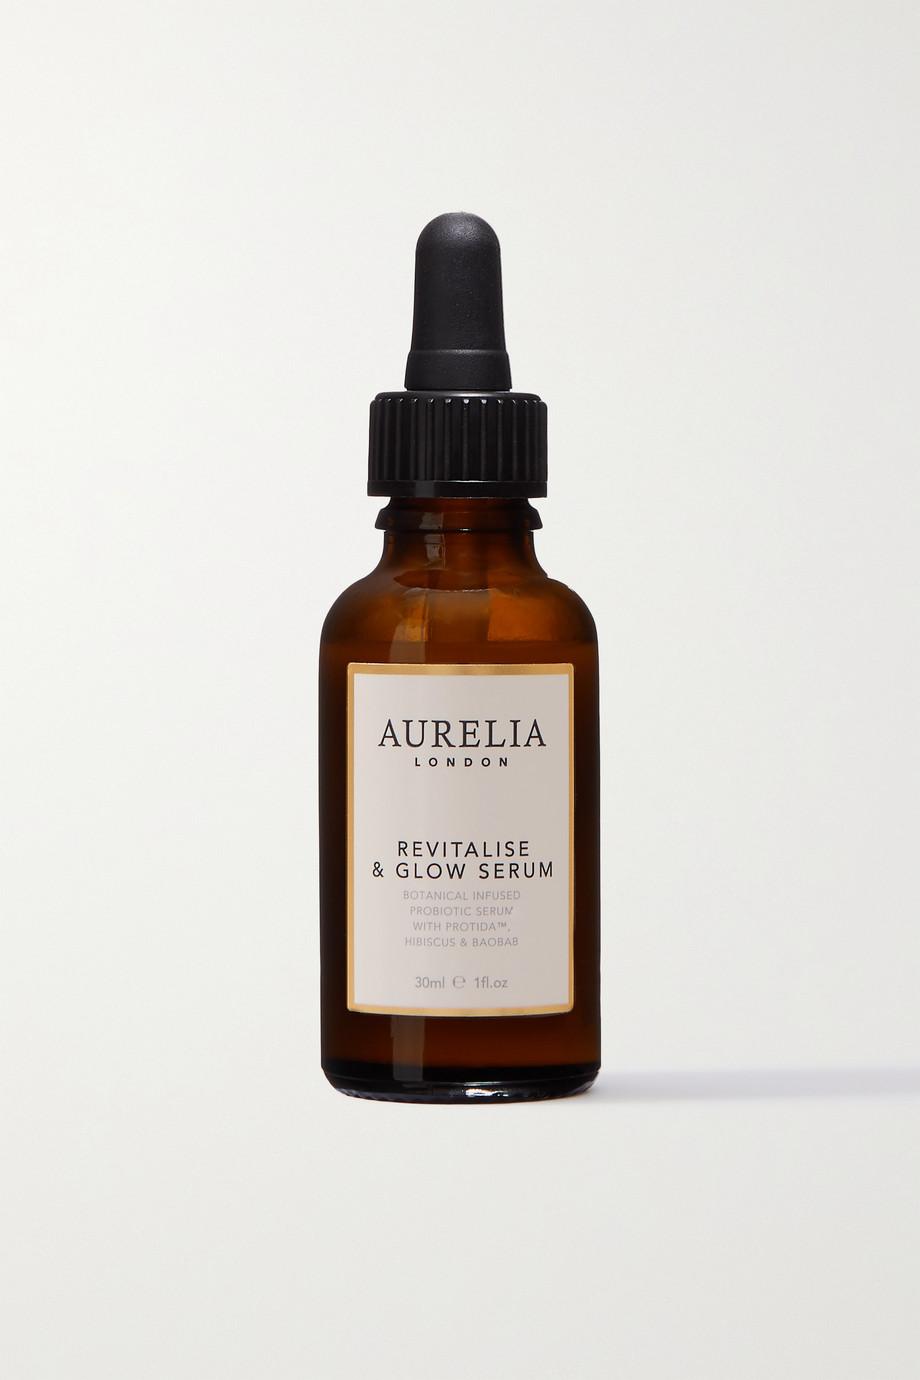 Revitalize & Glow Serum, 30ml, by Aurelia Probiotic Skincare